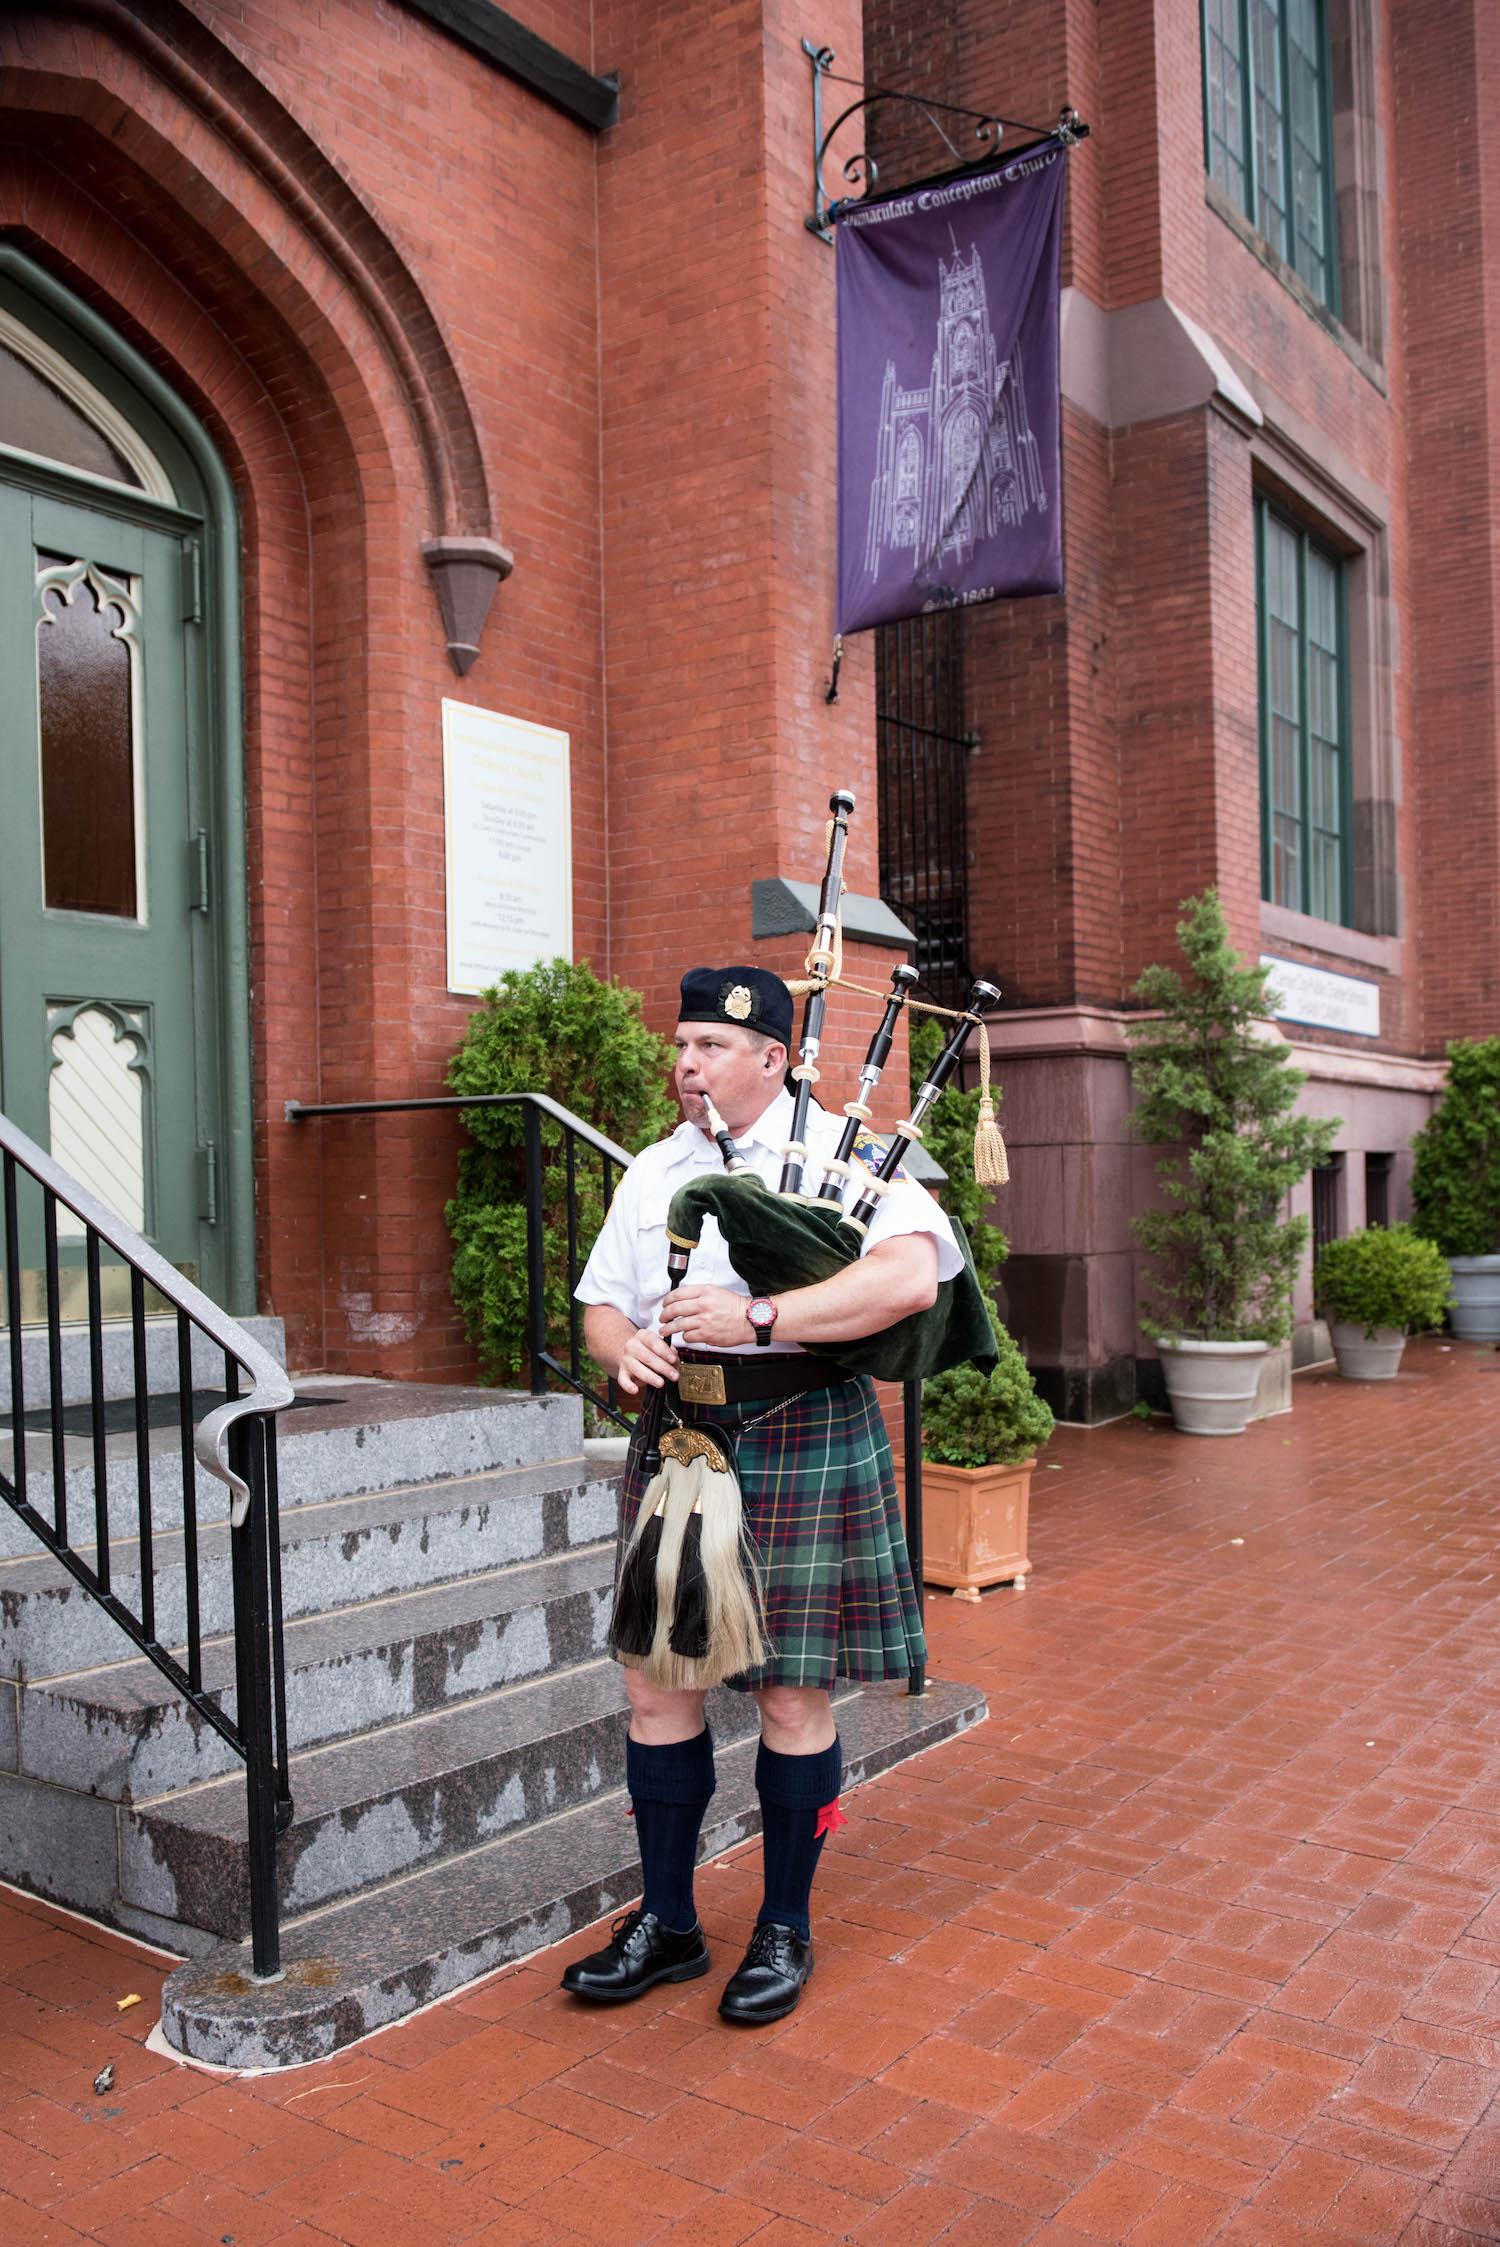 Washington DC Wedding - Sincerely Pete Events - Erin Tetterton Photography - Bagpiper at Wedding